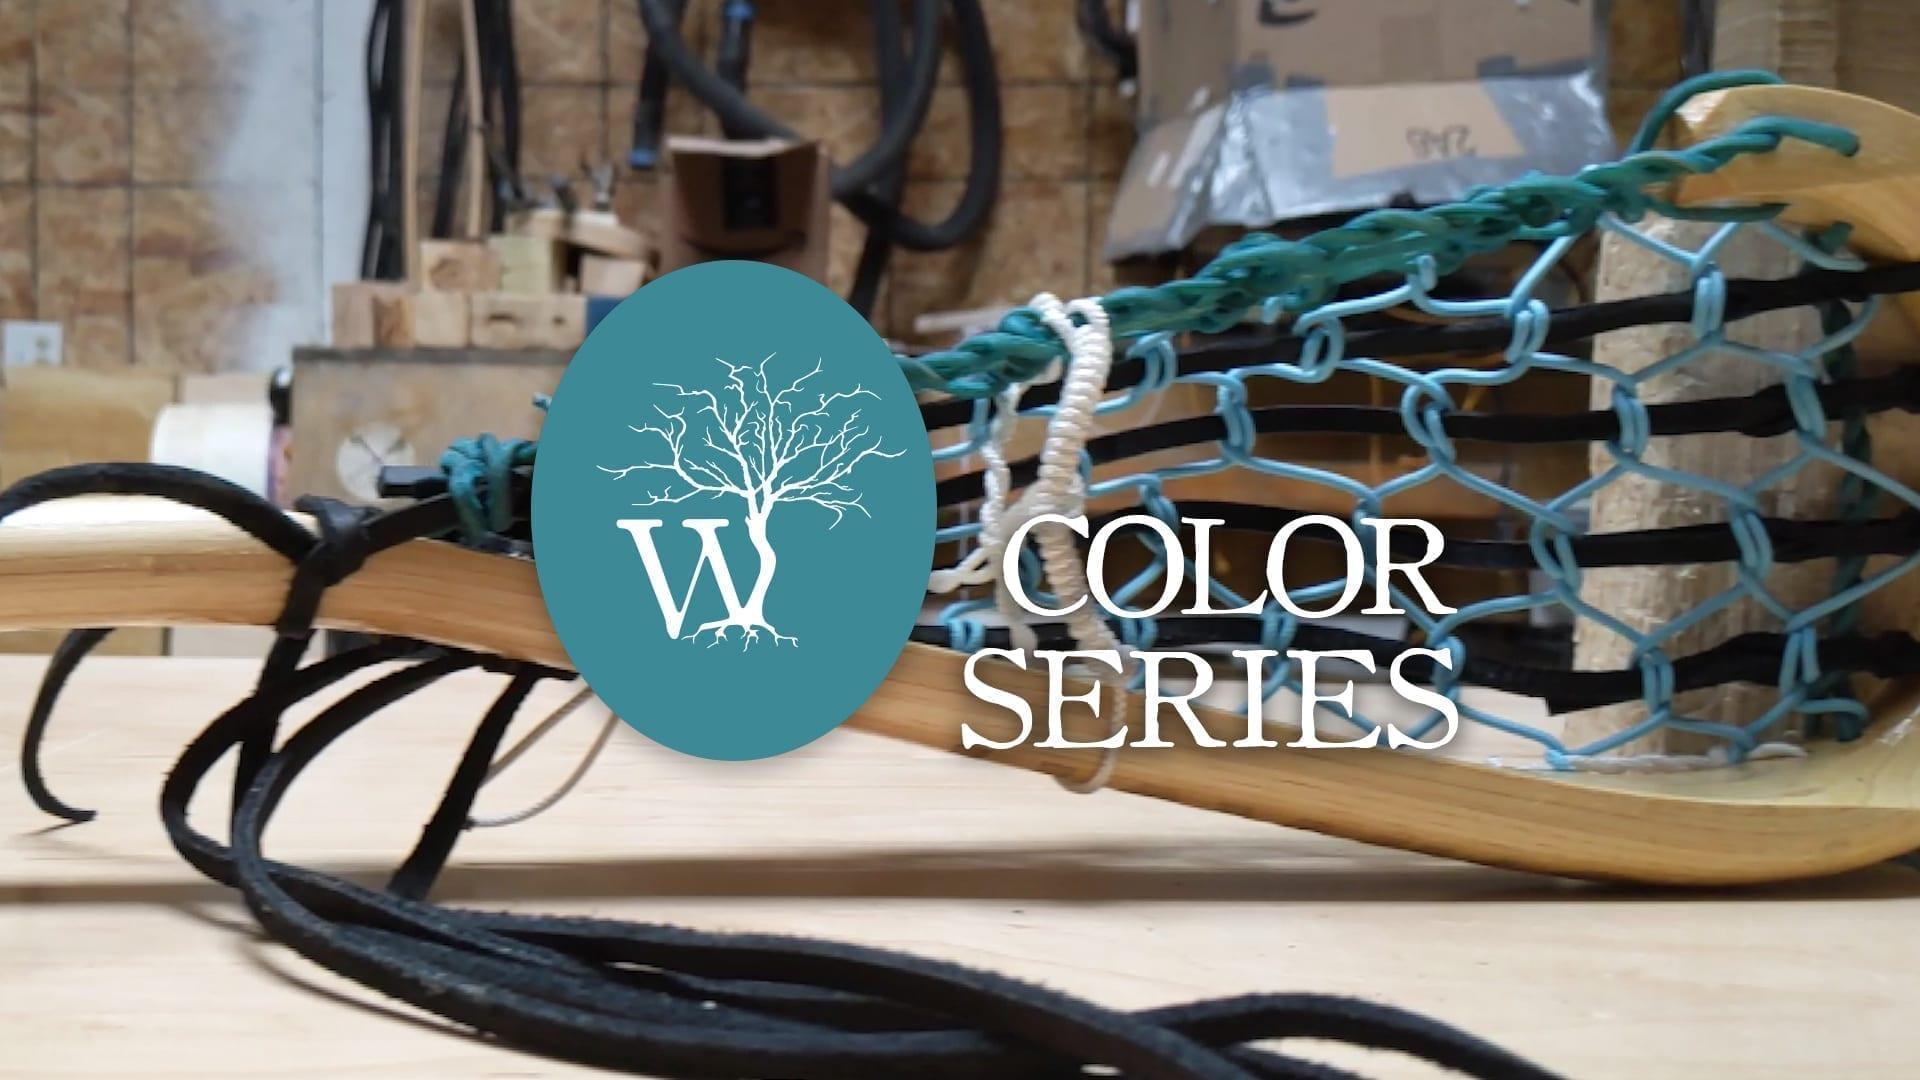 Eastern Mass Hawks Get Color Series Treatment Justin Skaggs WoodLacrosseSticks.com